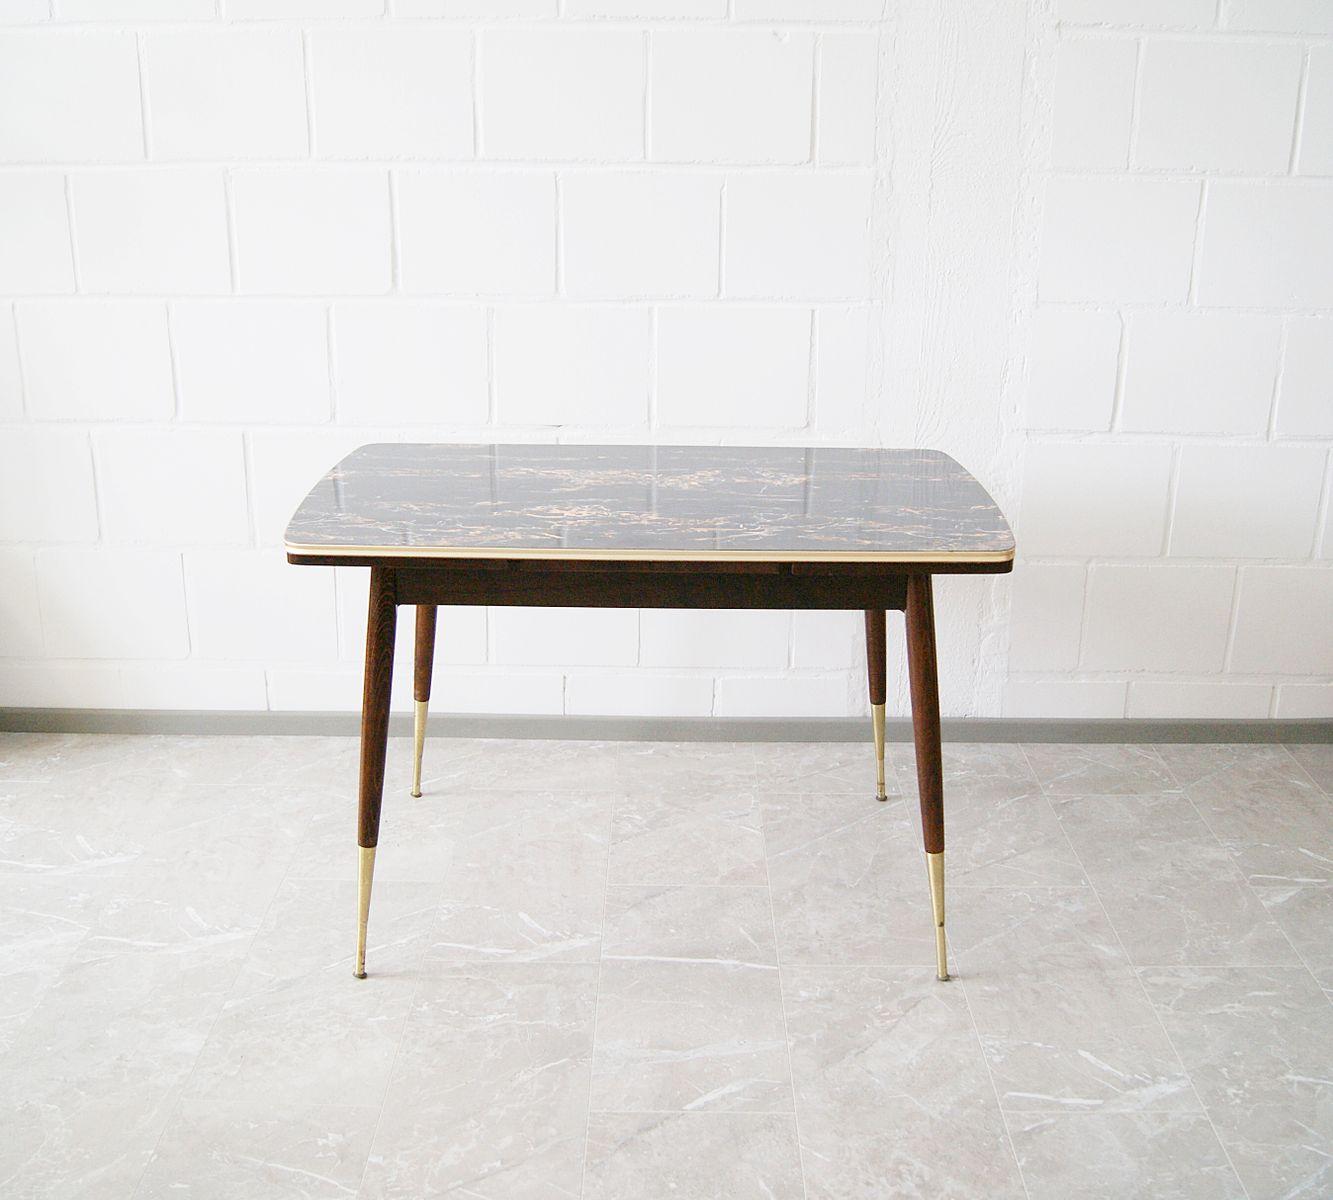 Coffee Table Extendable Legs: Height-Adjustable And Extendable Coffee Table, 1950s For